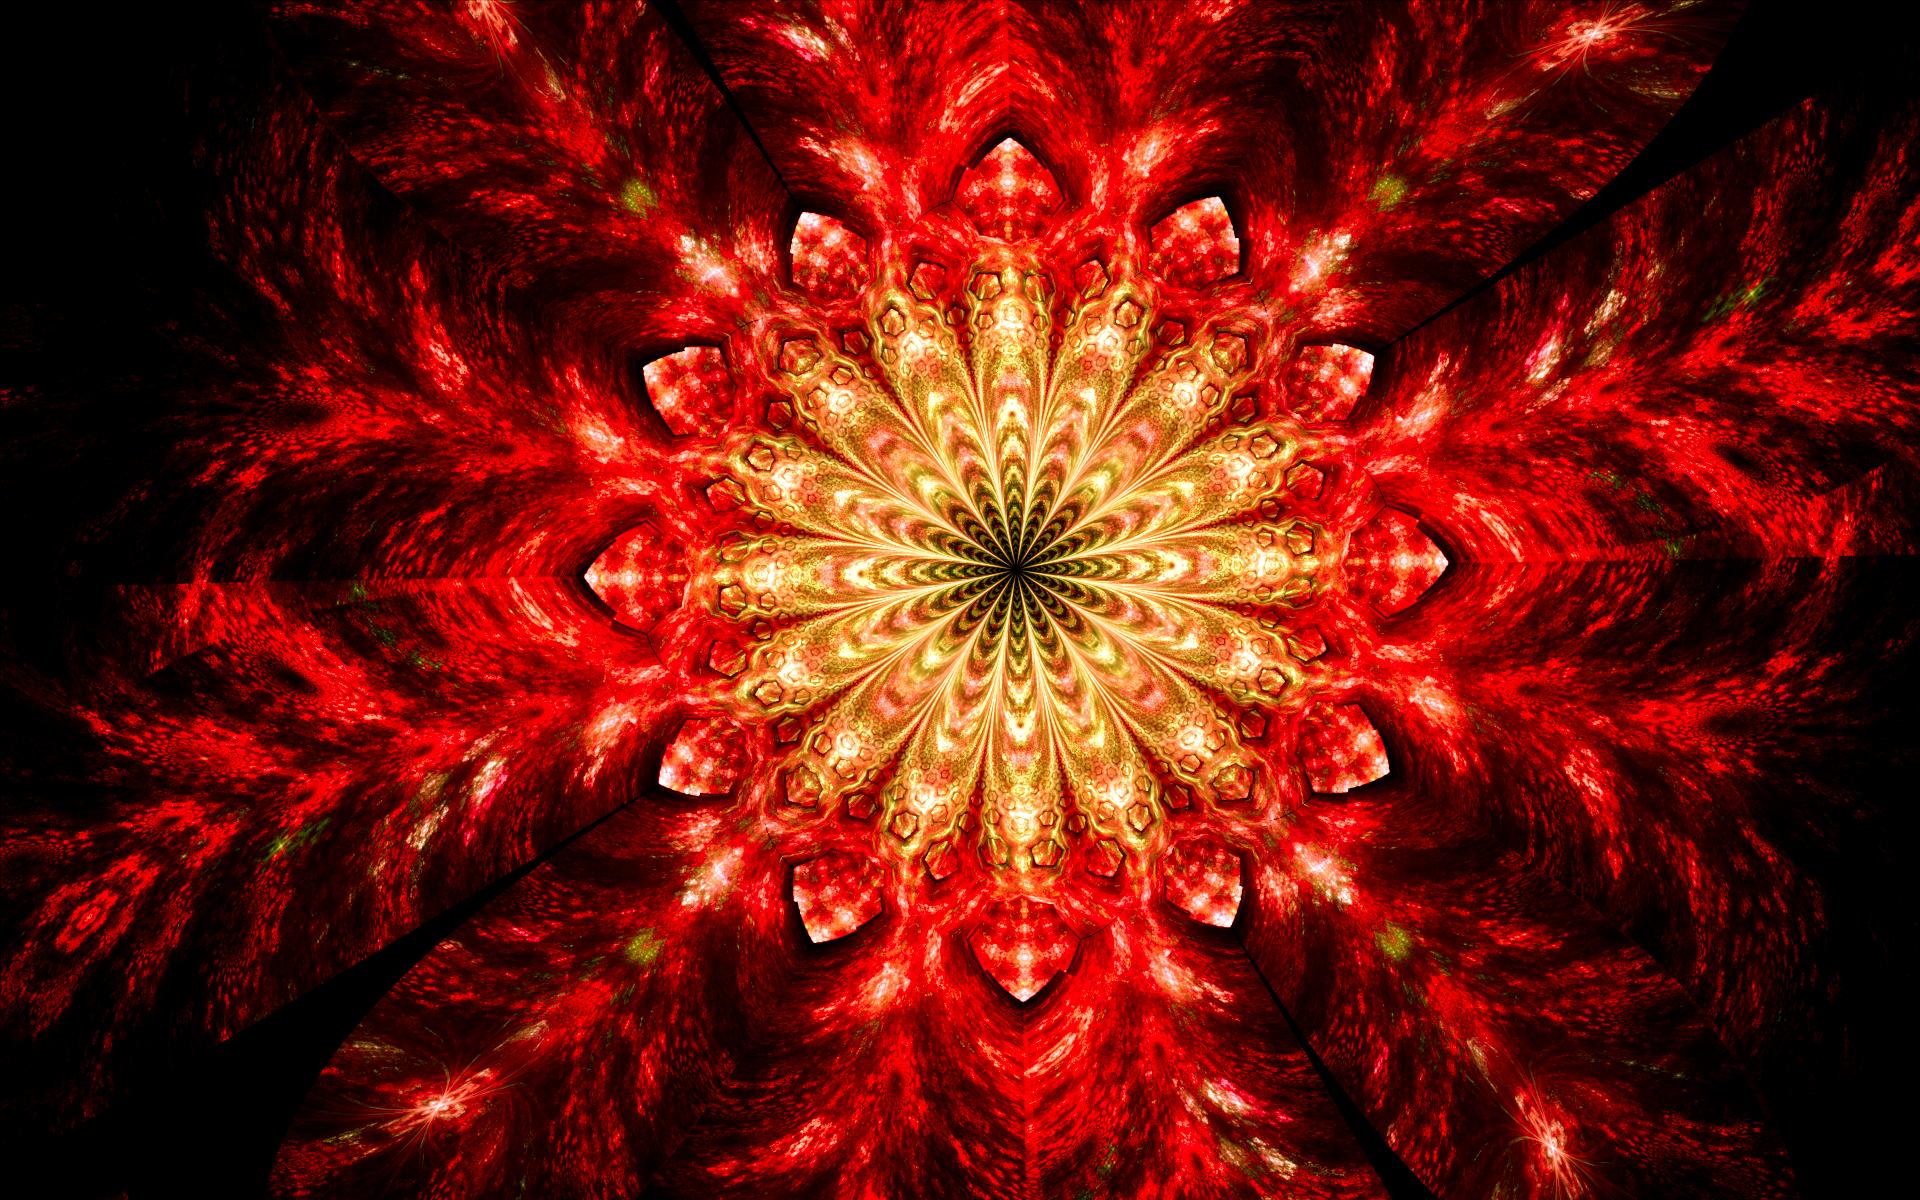 The Burst by Fractamonium